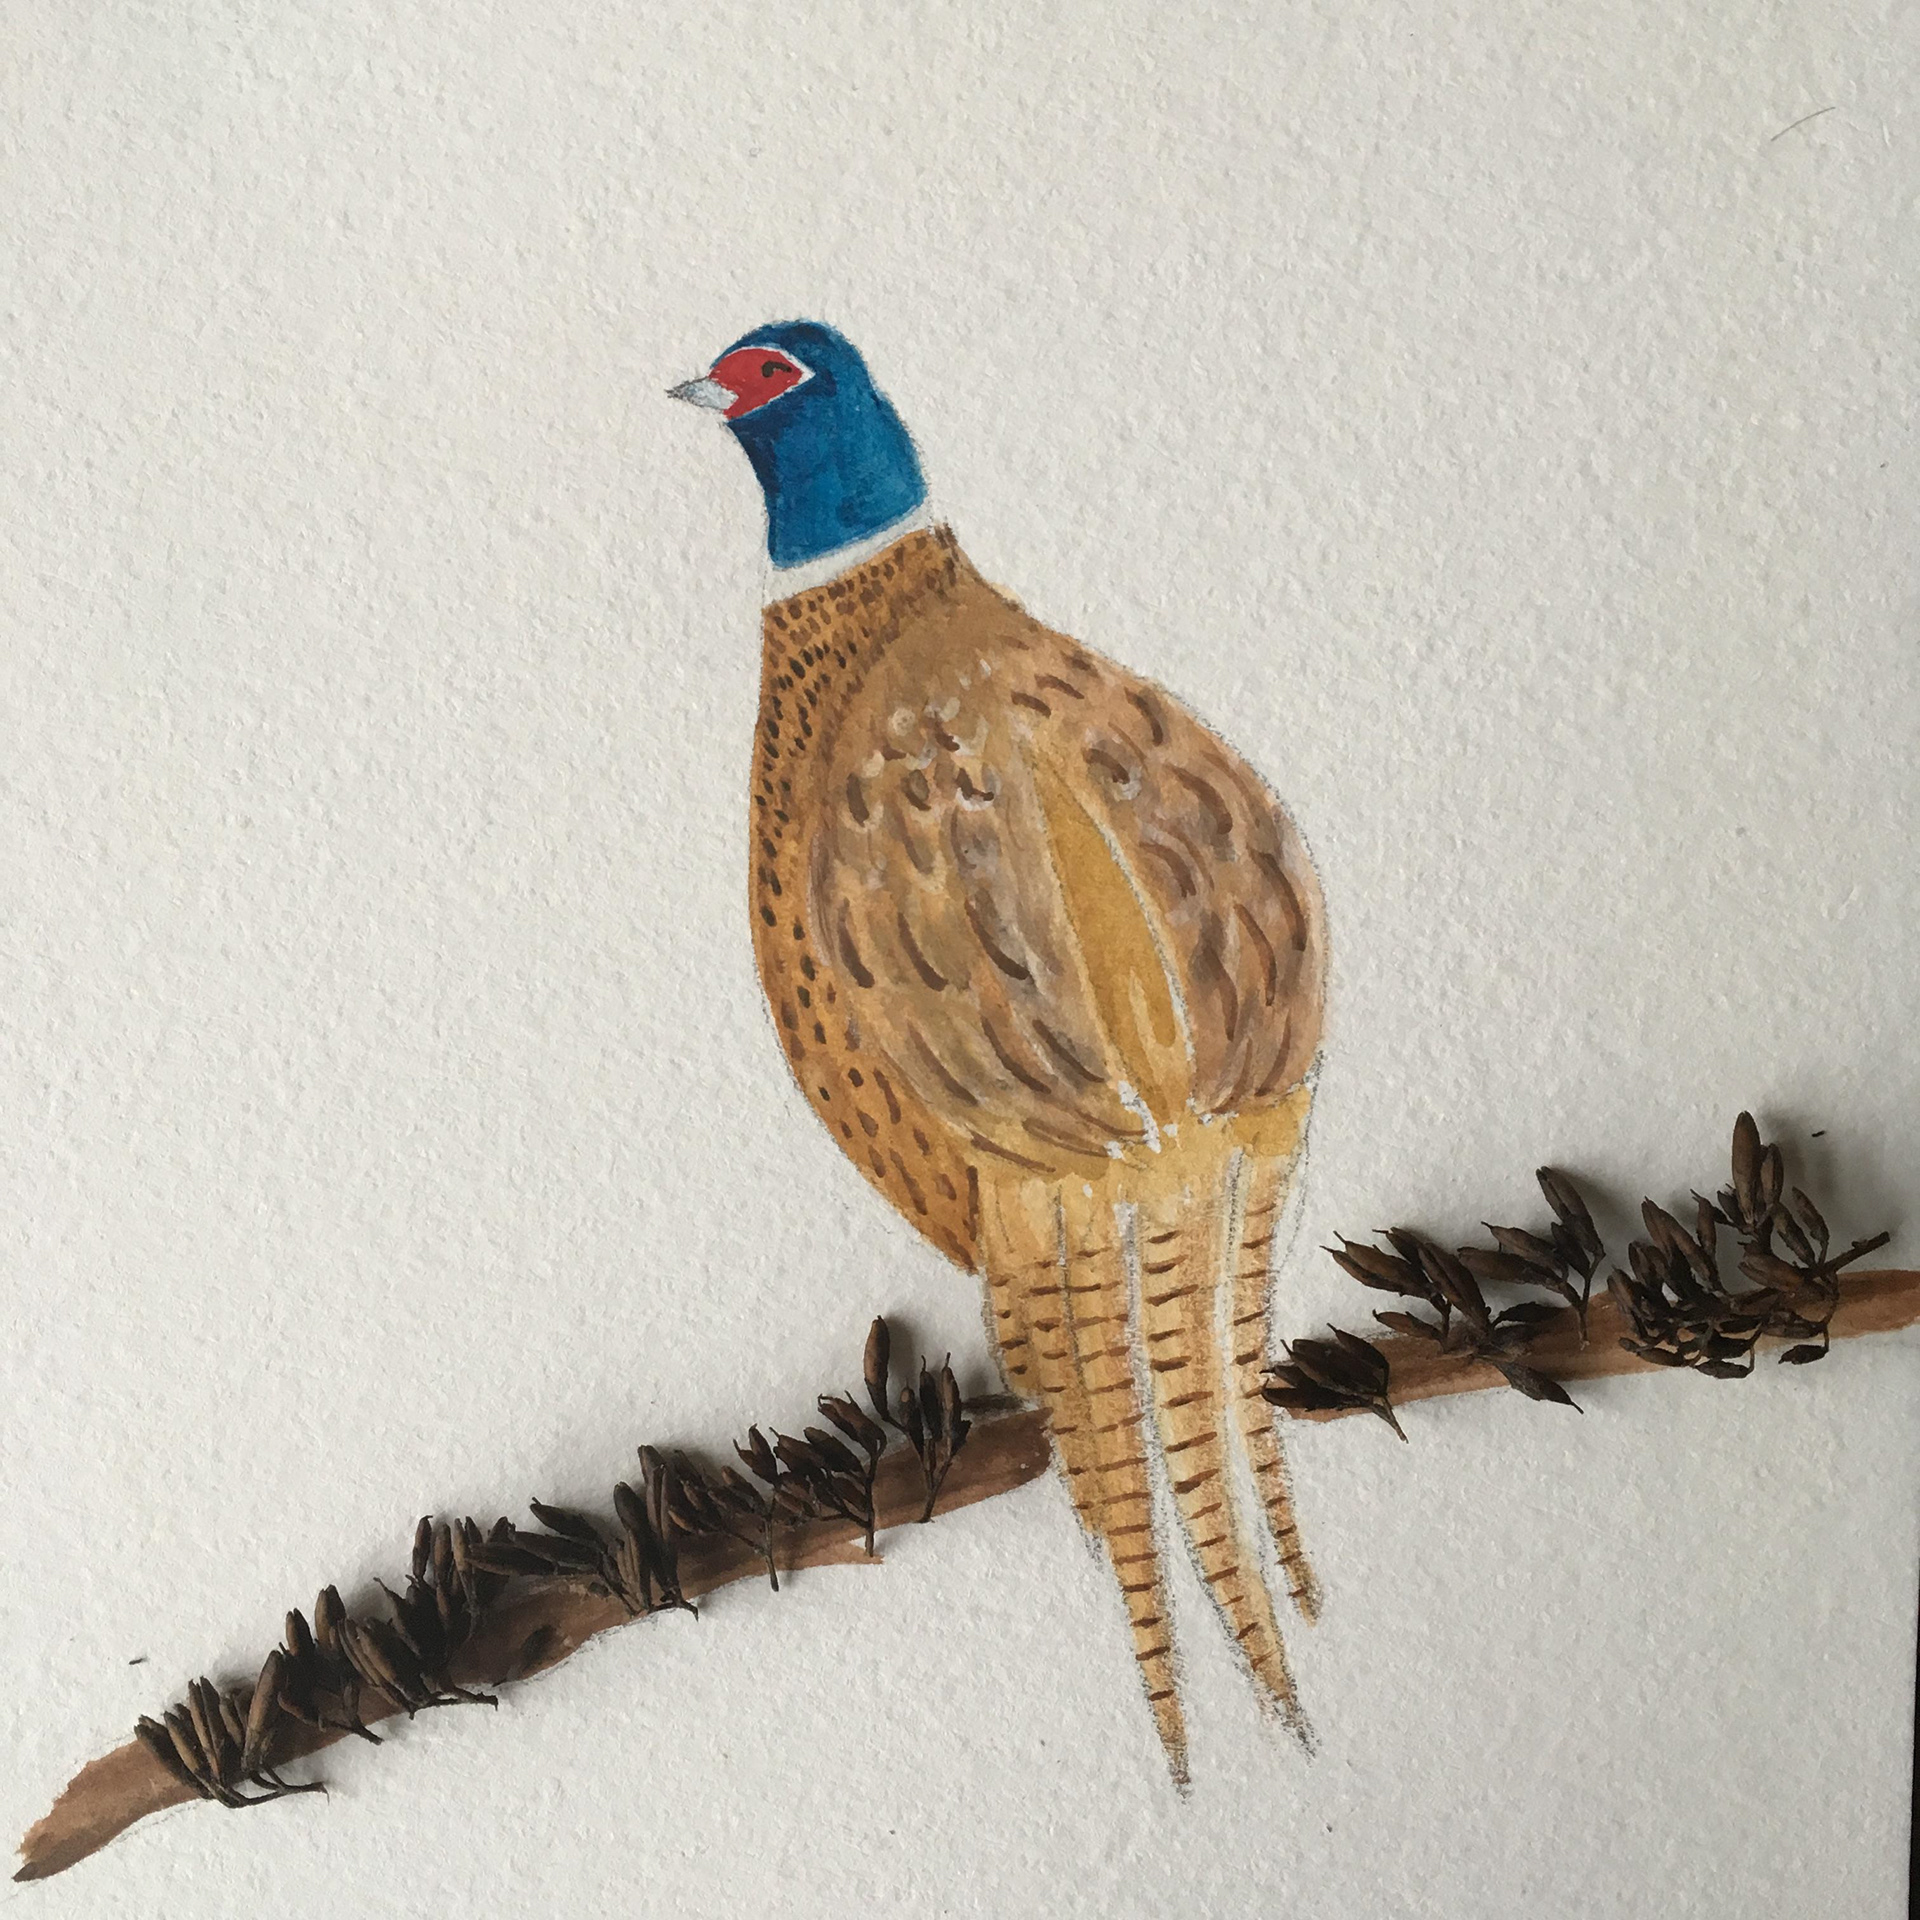 Chestnut pheasant